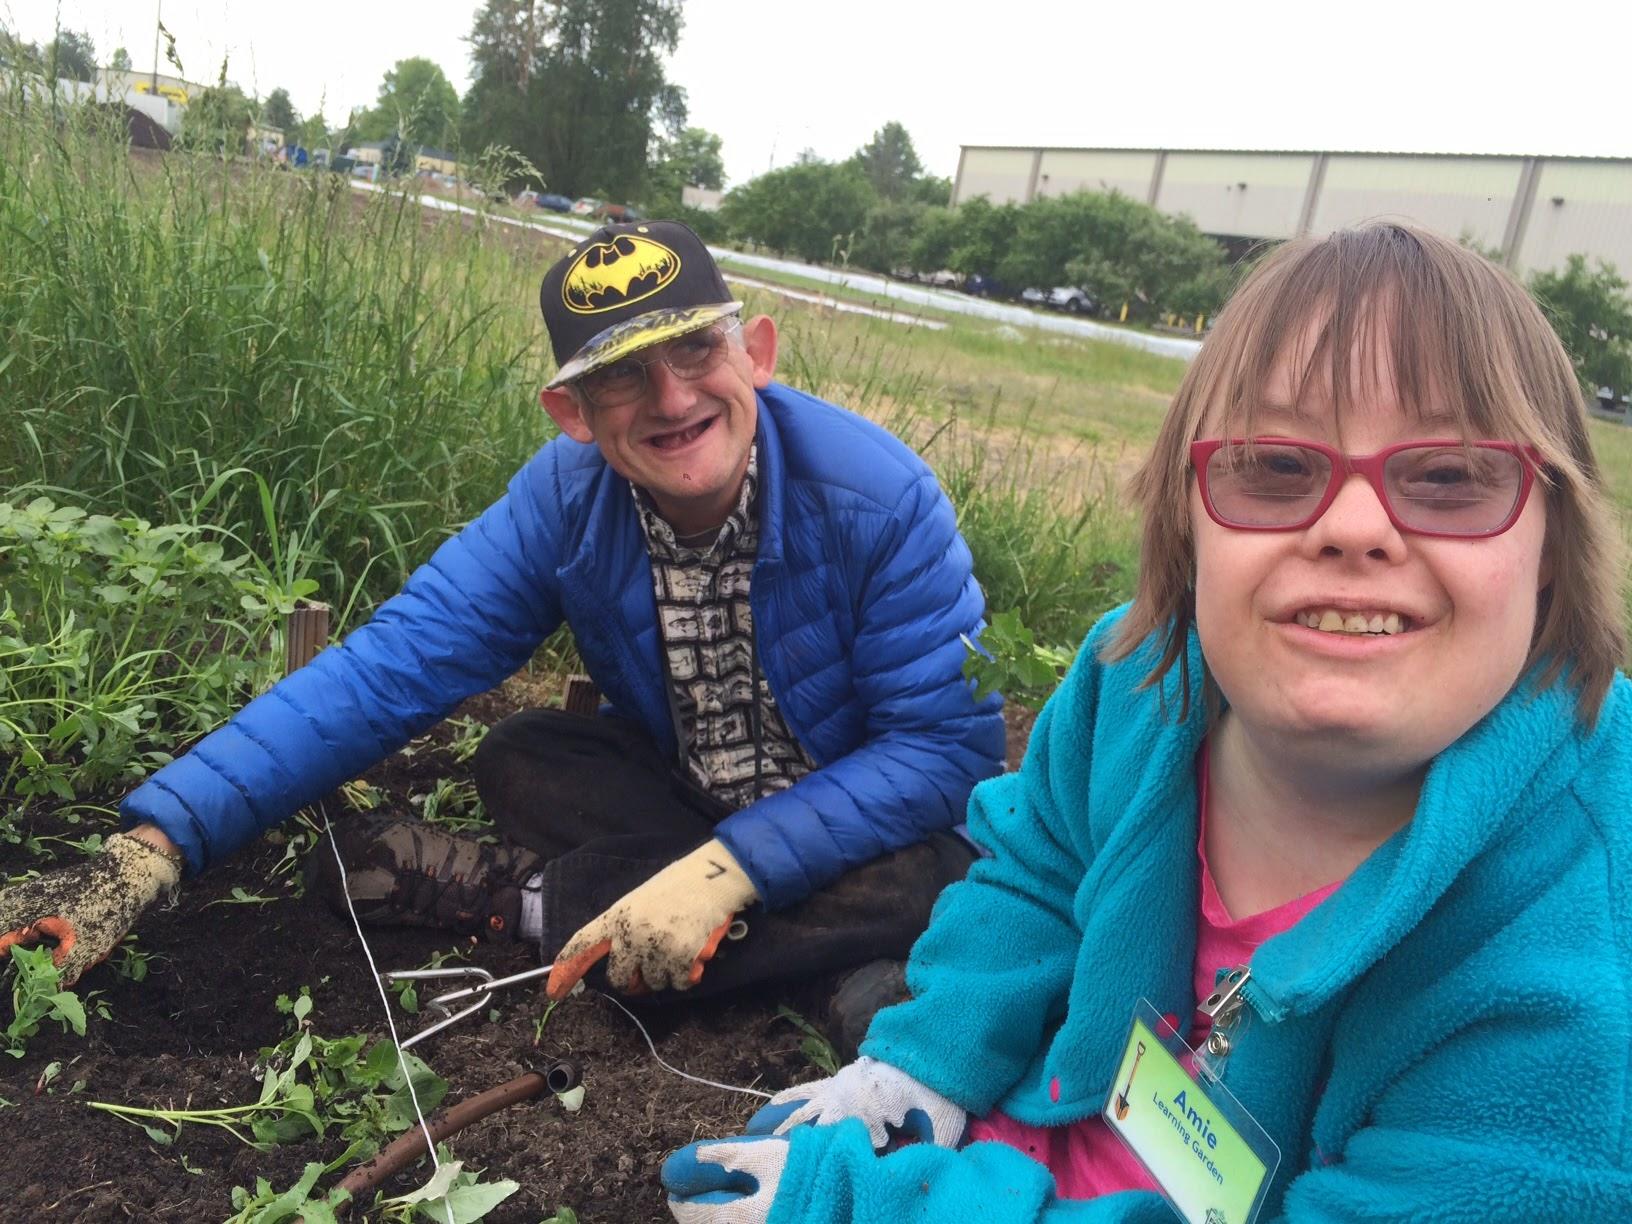 Participants volunteer at the Oregon Food Bank